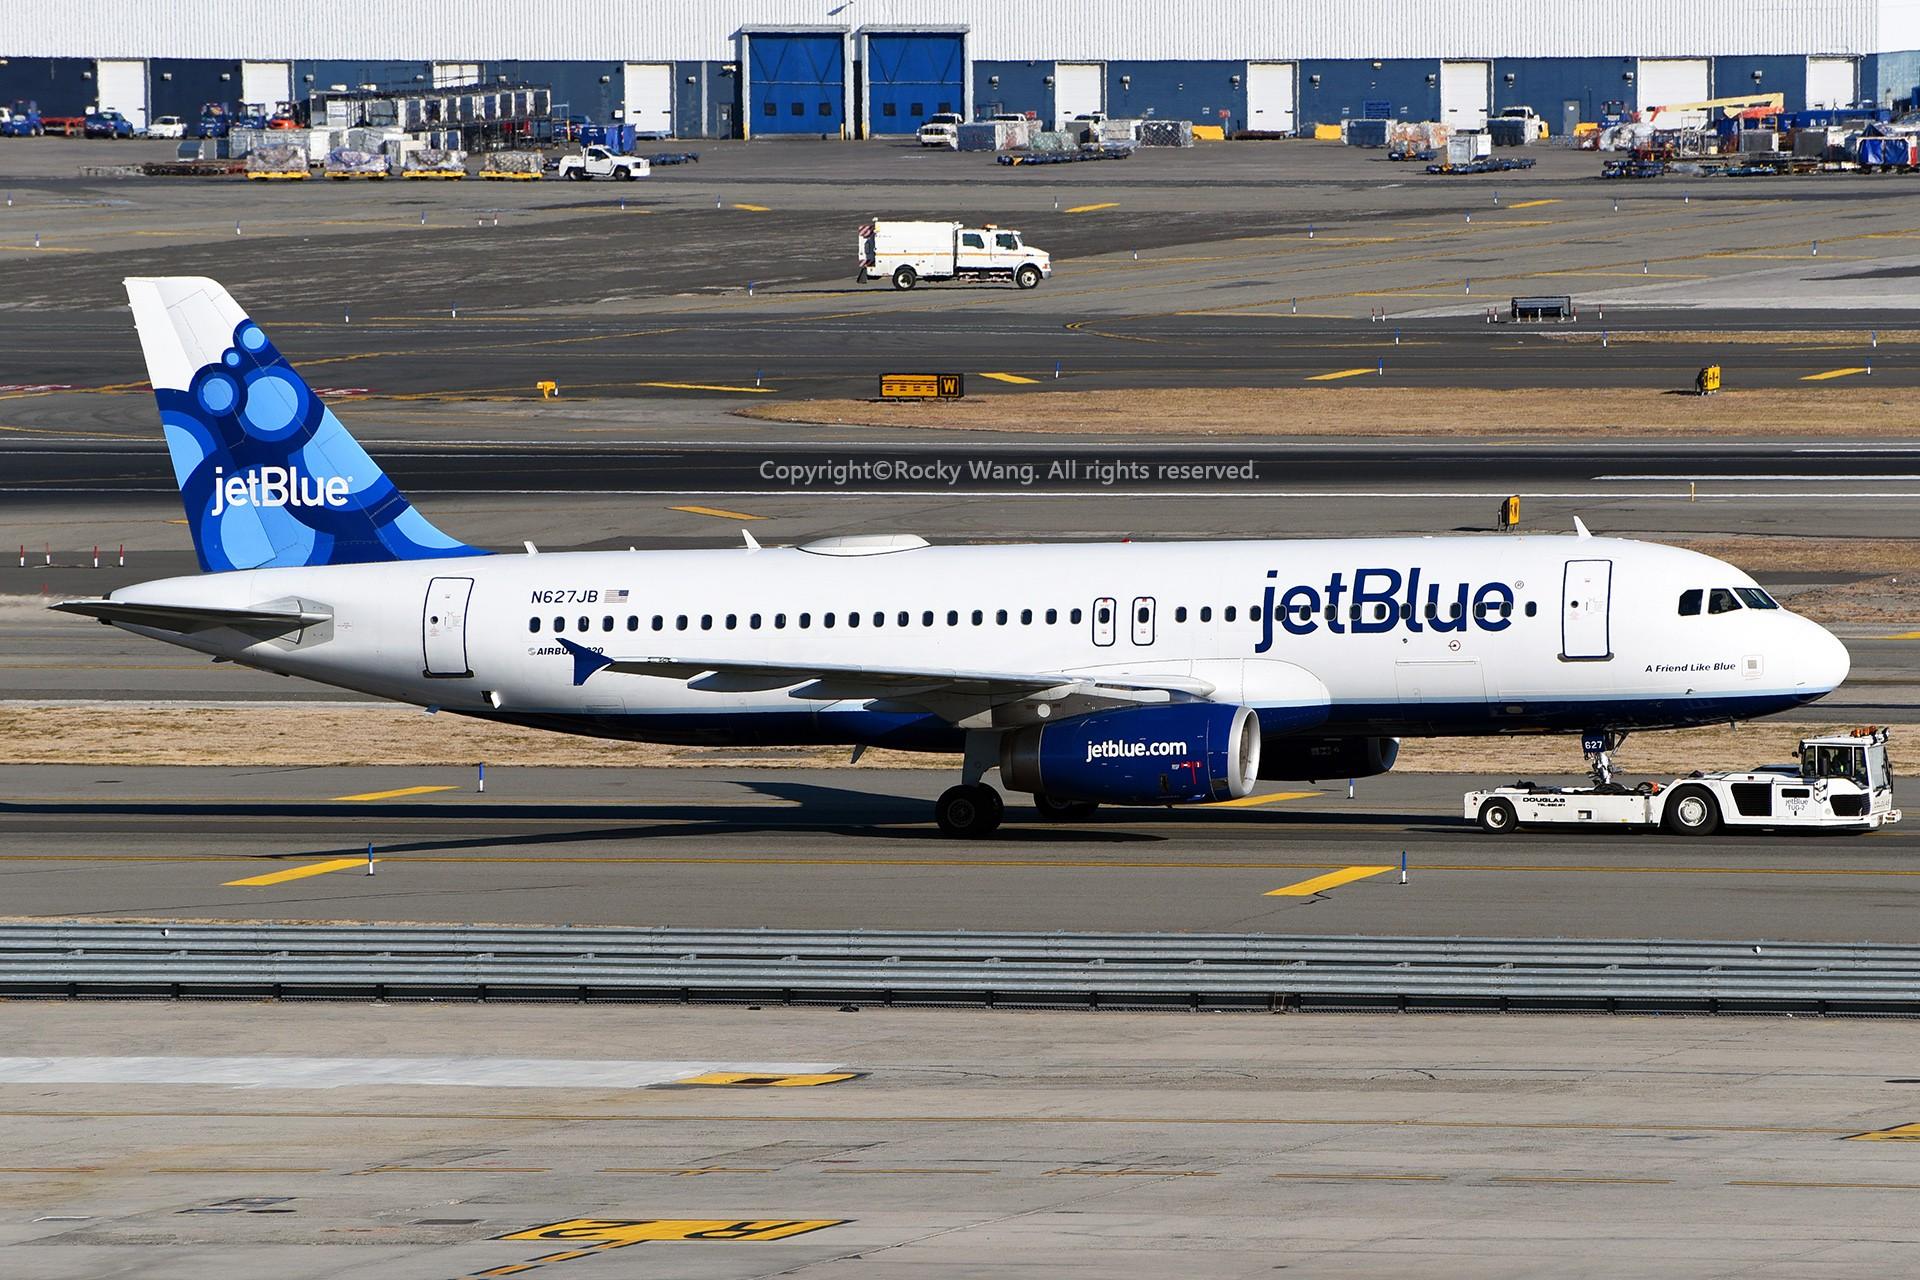 Re:[原创]窄体连连看 AIRBUS A320-232 N627JB 美国纽约约翰·菲茨杰拉德·肯尼迪国际机场